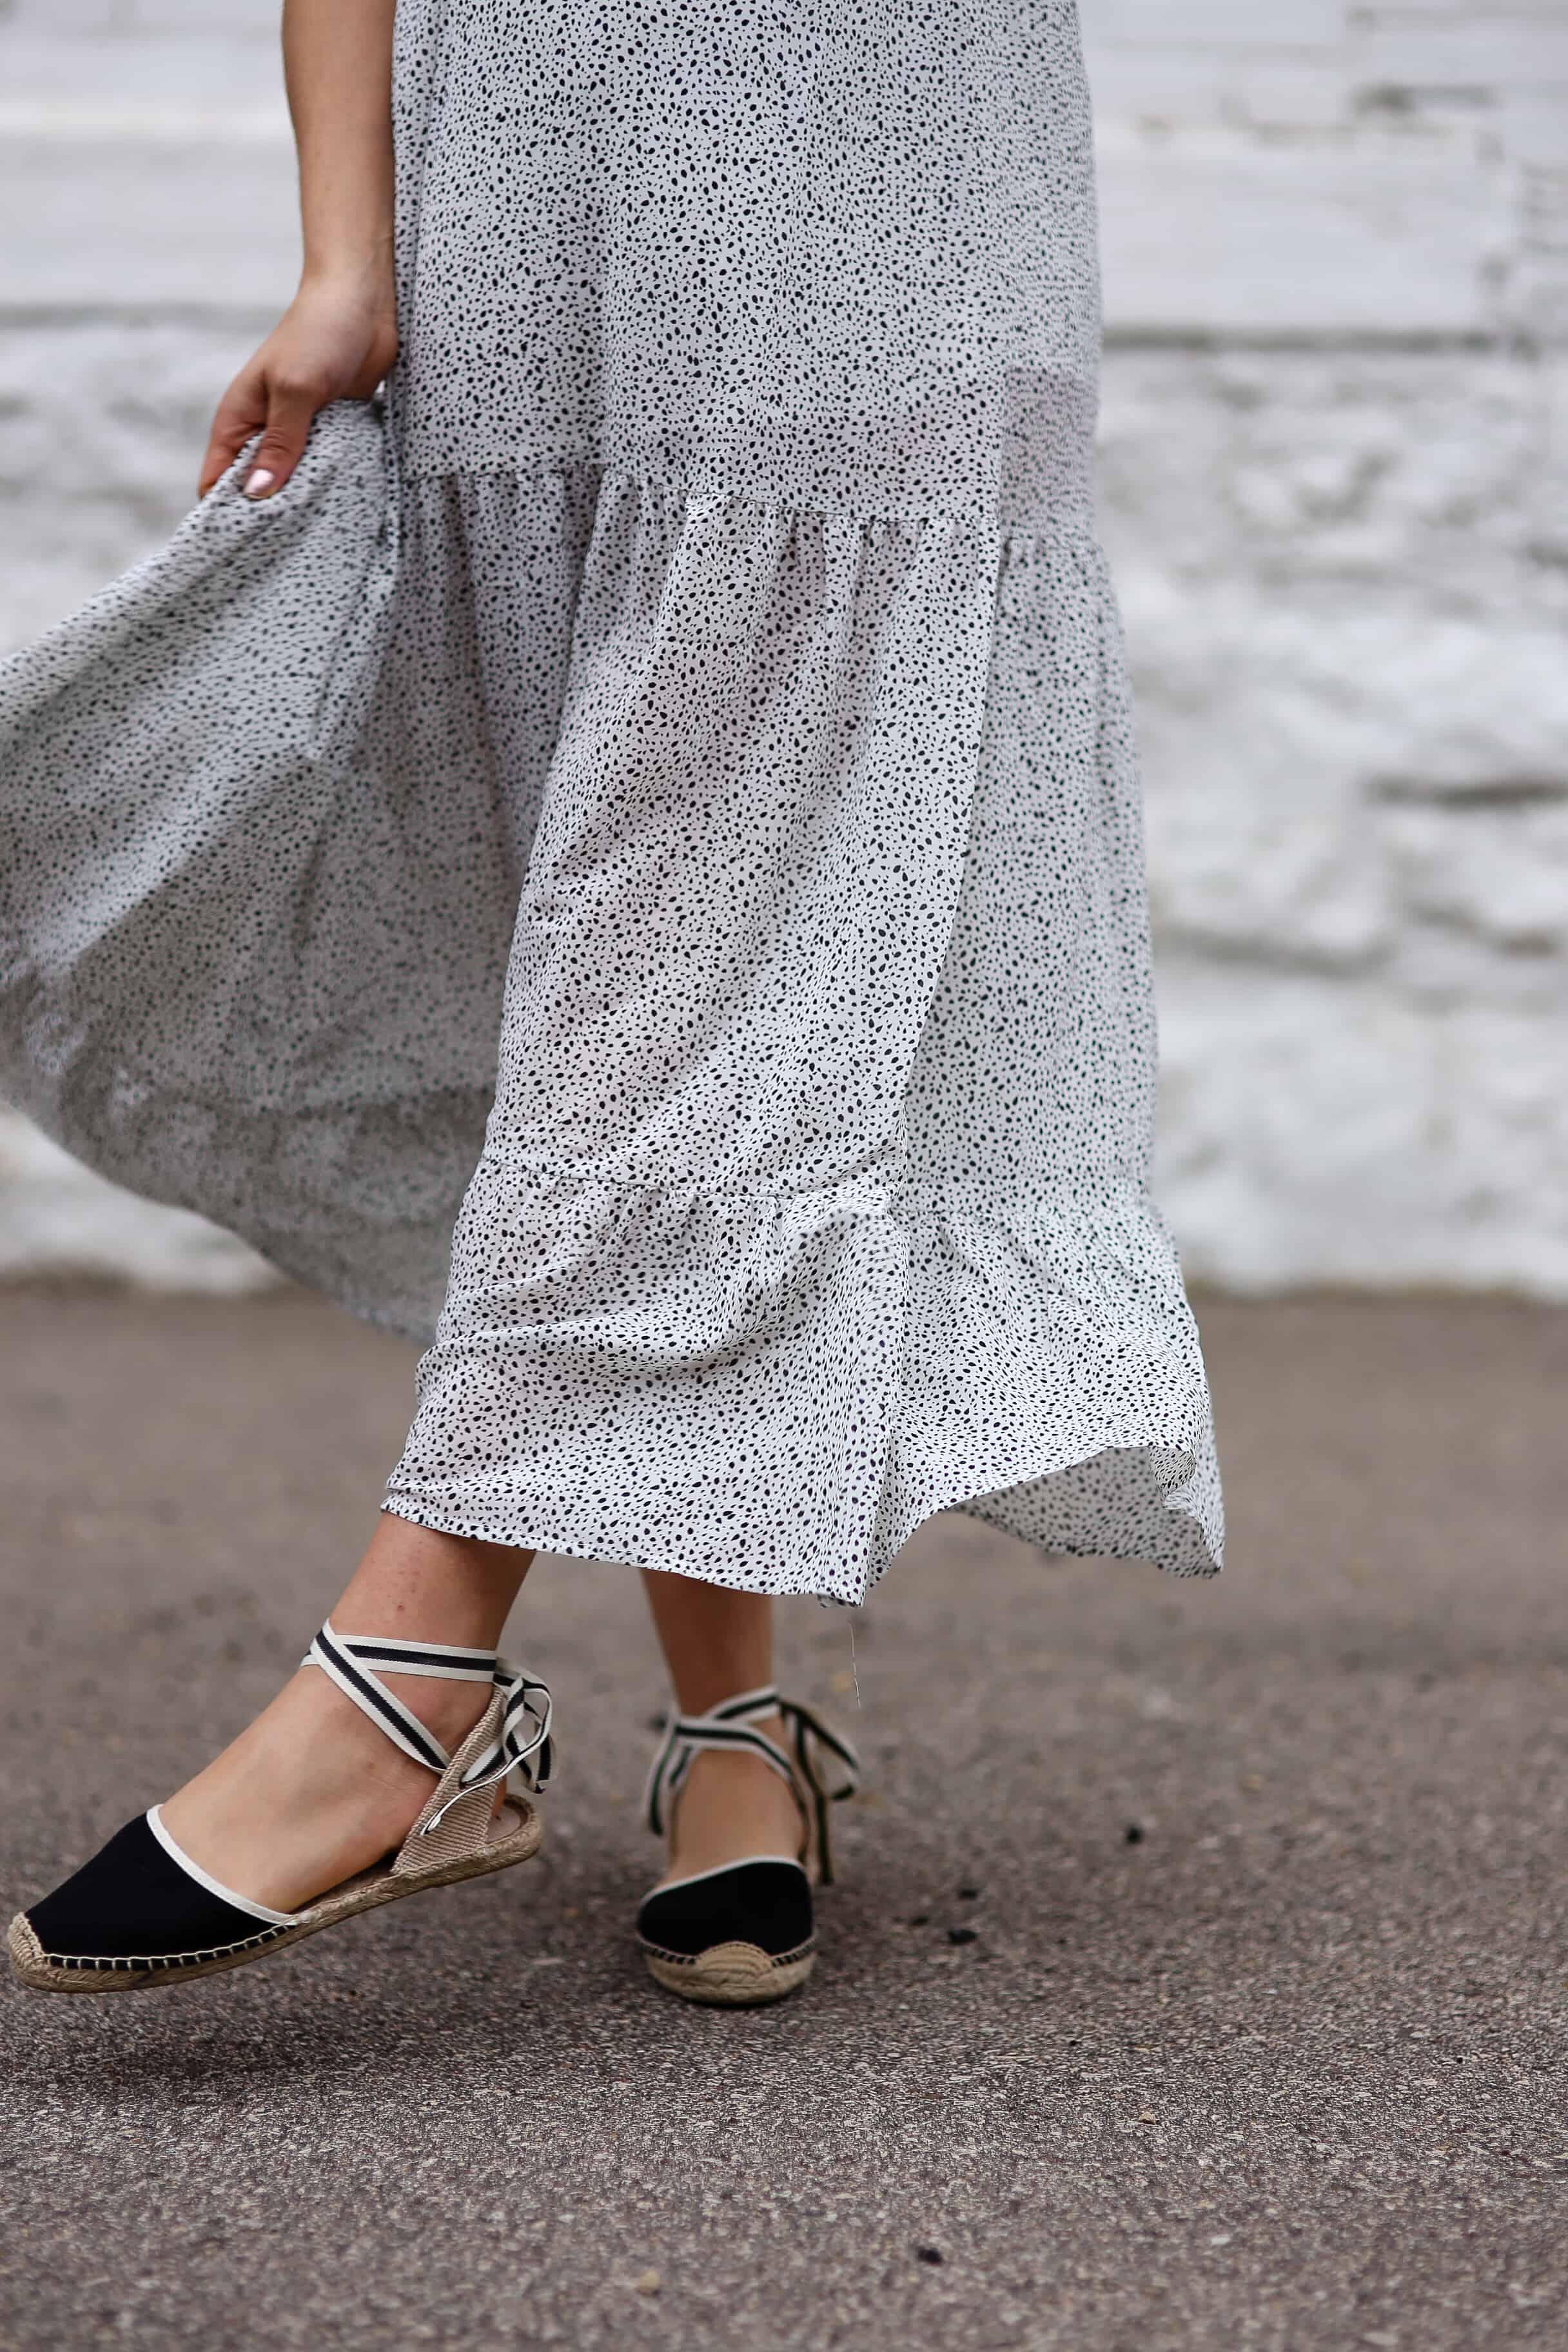 spring summer maternity fashion